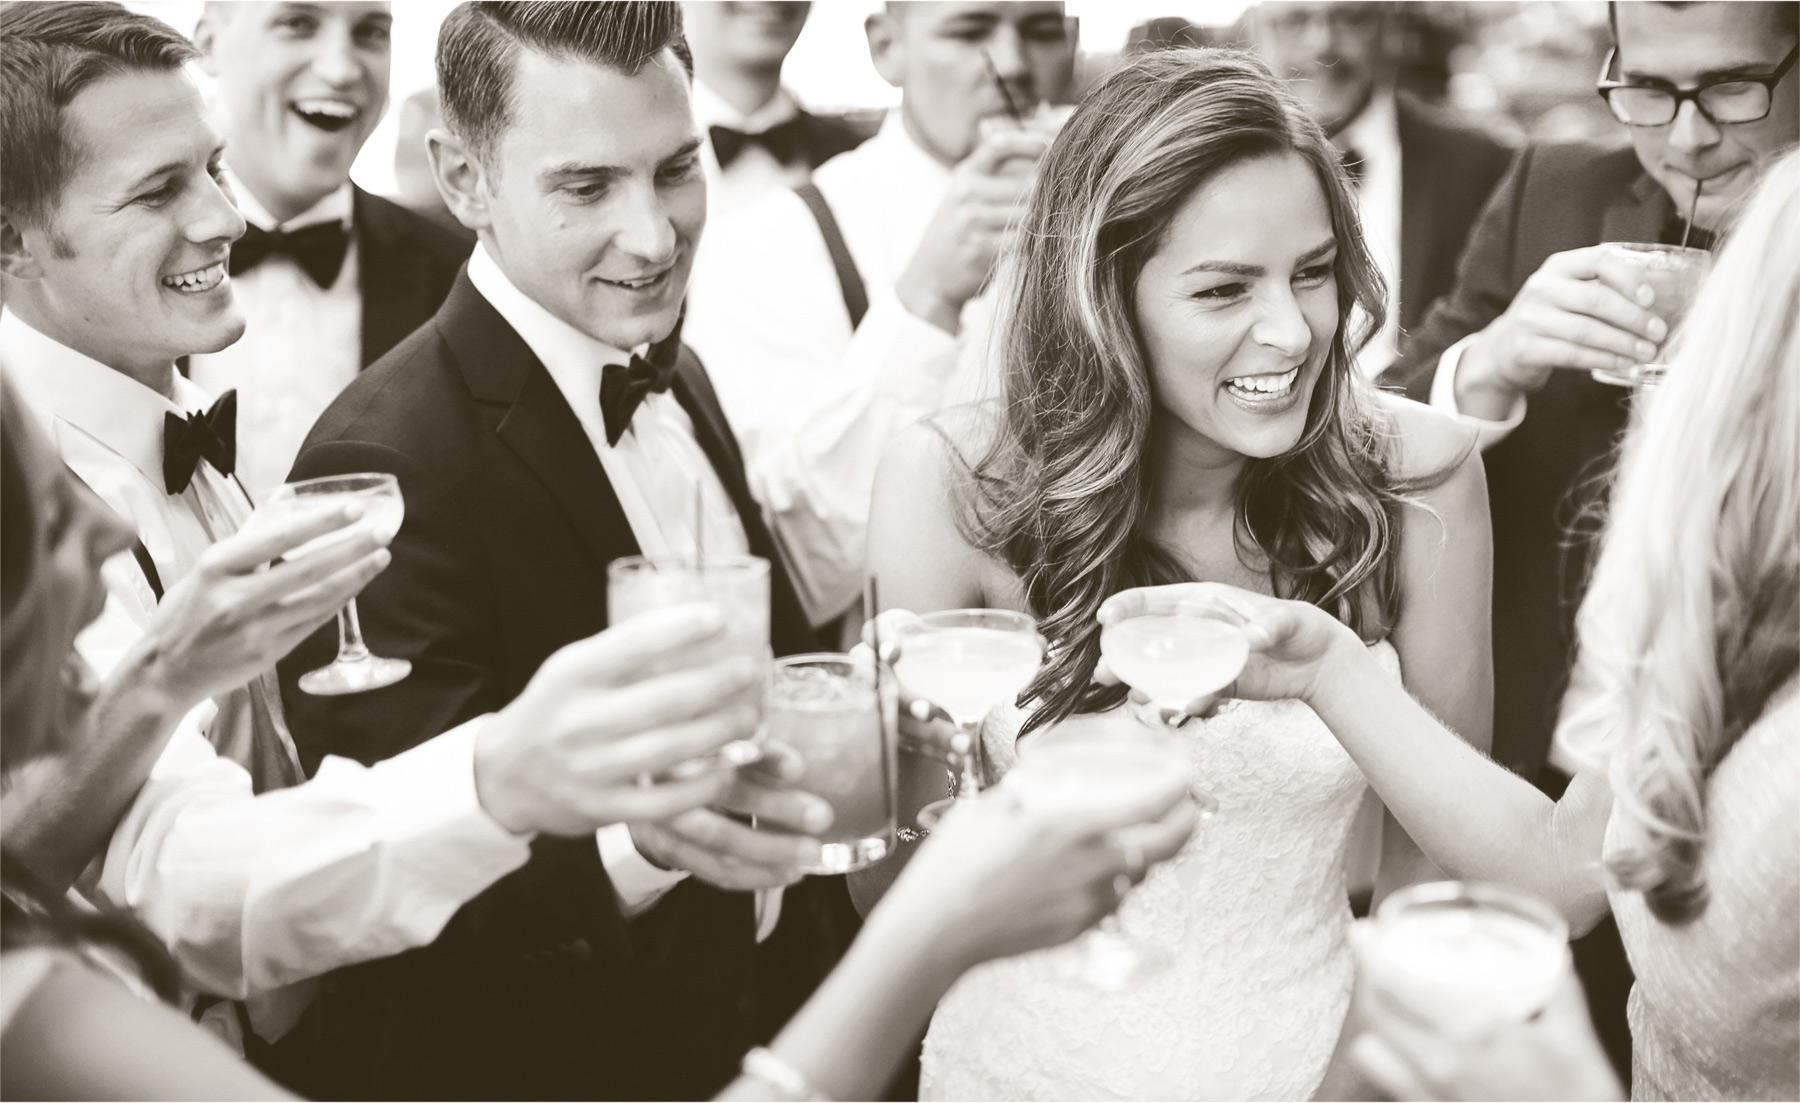 14-Saint-Paul-Minnesota-Wedding-Photographer-by-Andrew-Vick-Photography-Summer-Bride-Groom-Groomsmen-Bridesmaids-Bridal-Party-Drinks-Sepia-Molly-and-Dan.jpg